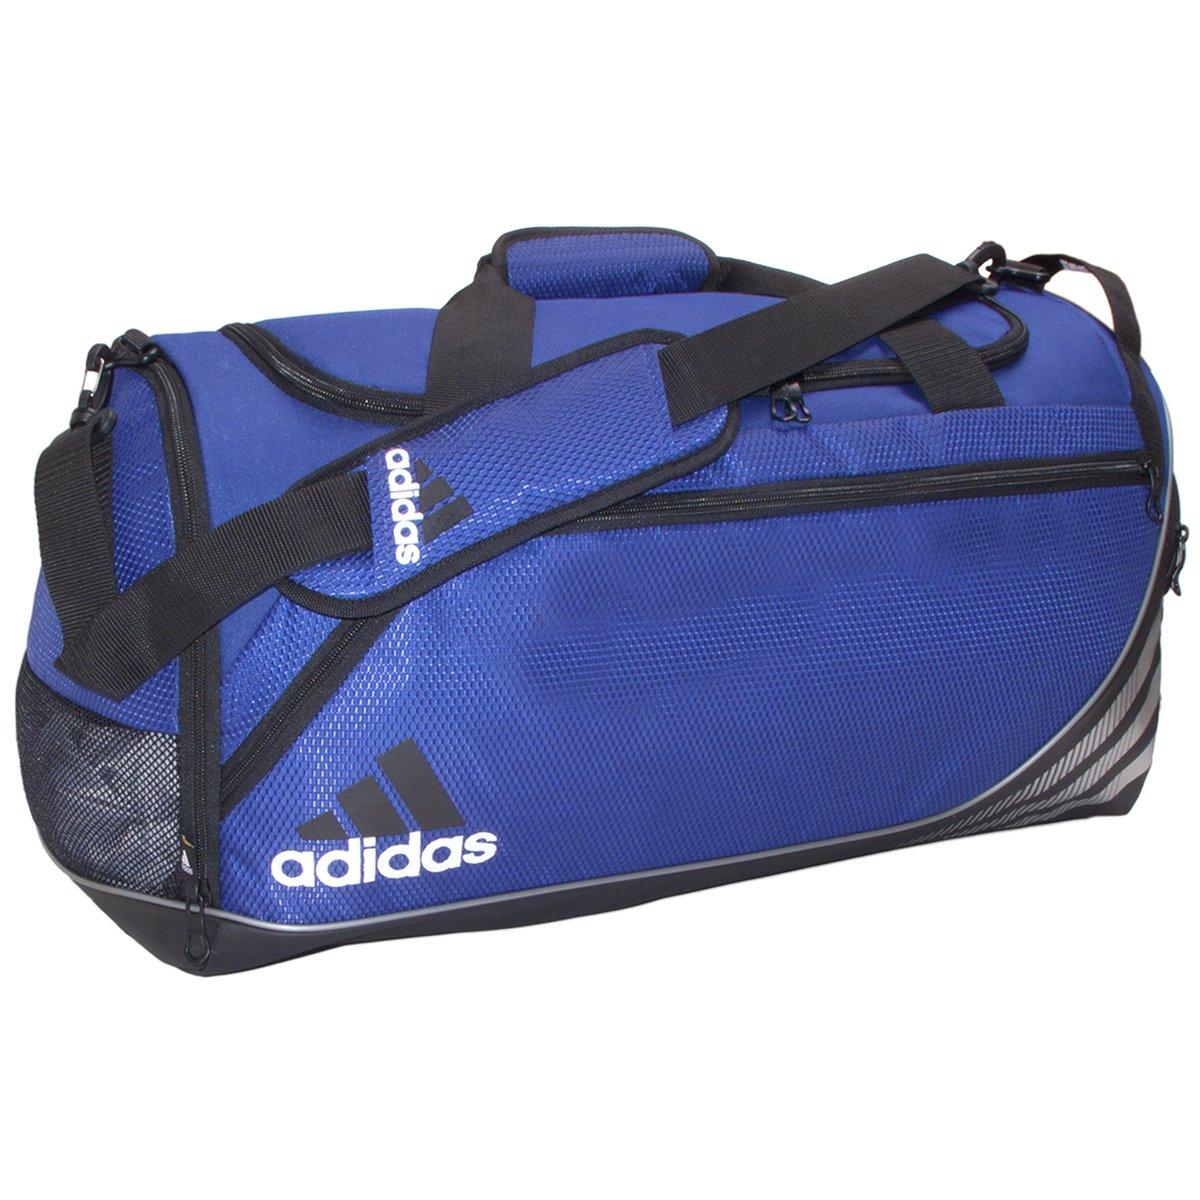 adidas Team Speed Duffel Bag (Medium) Cobalt/Black Agron Inc (adidas Bags) Team Speed Duffel Medium